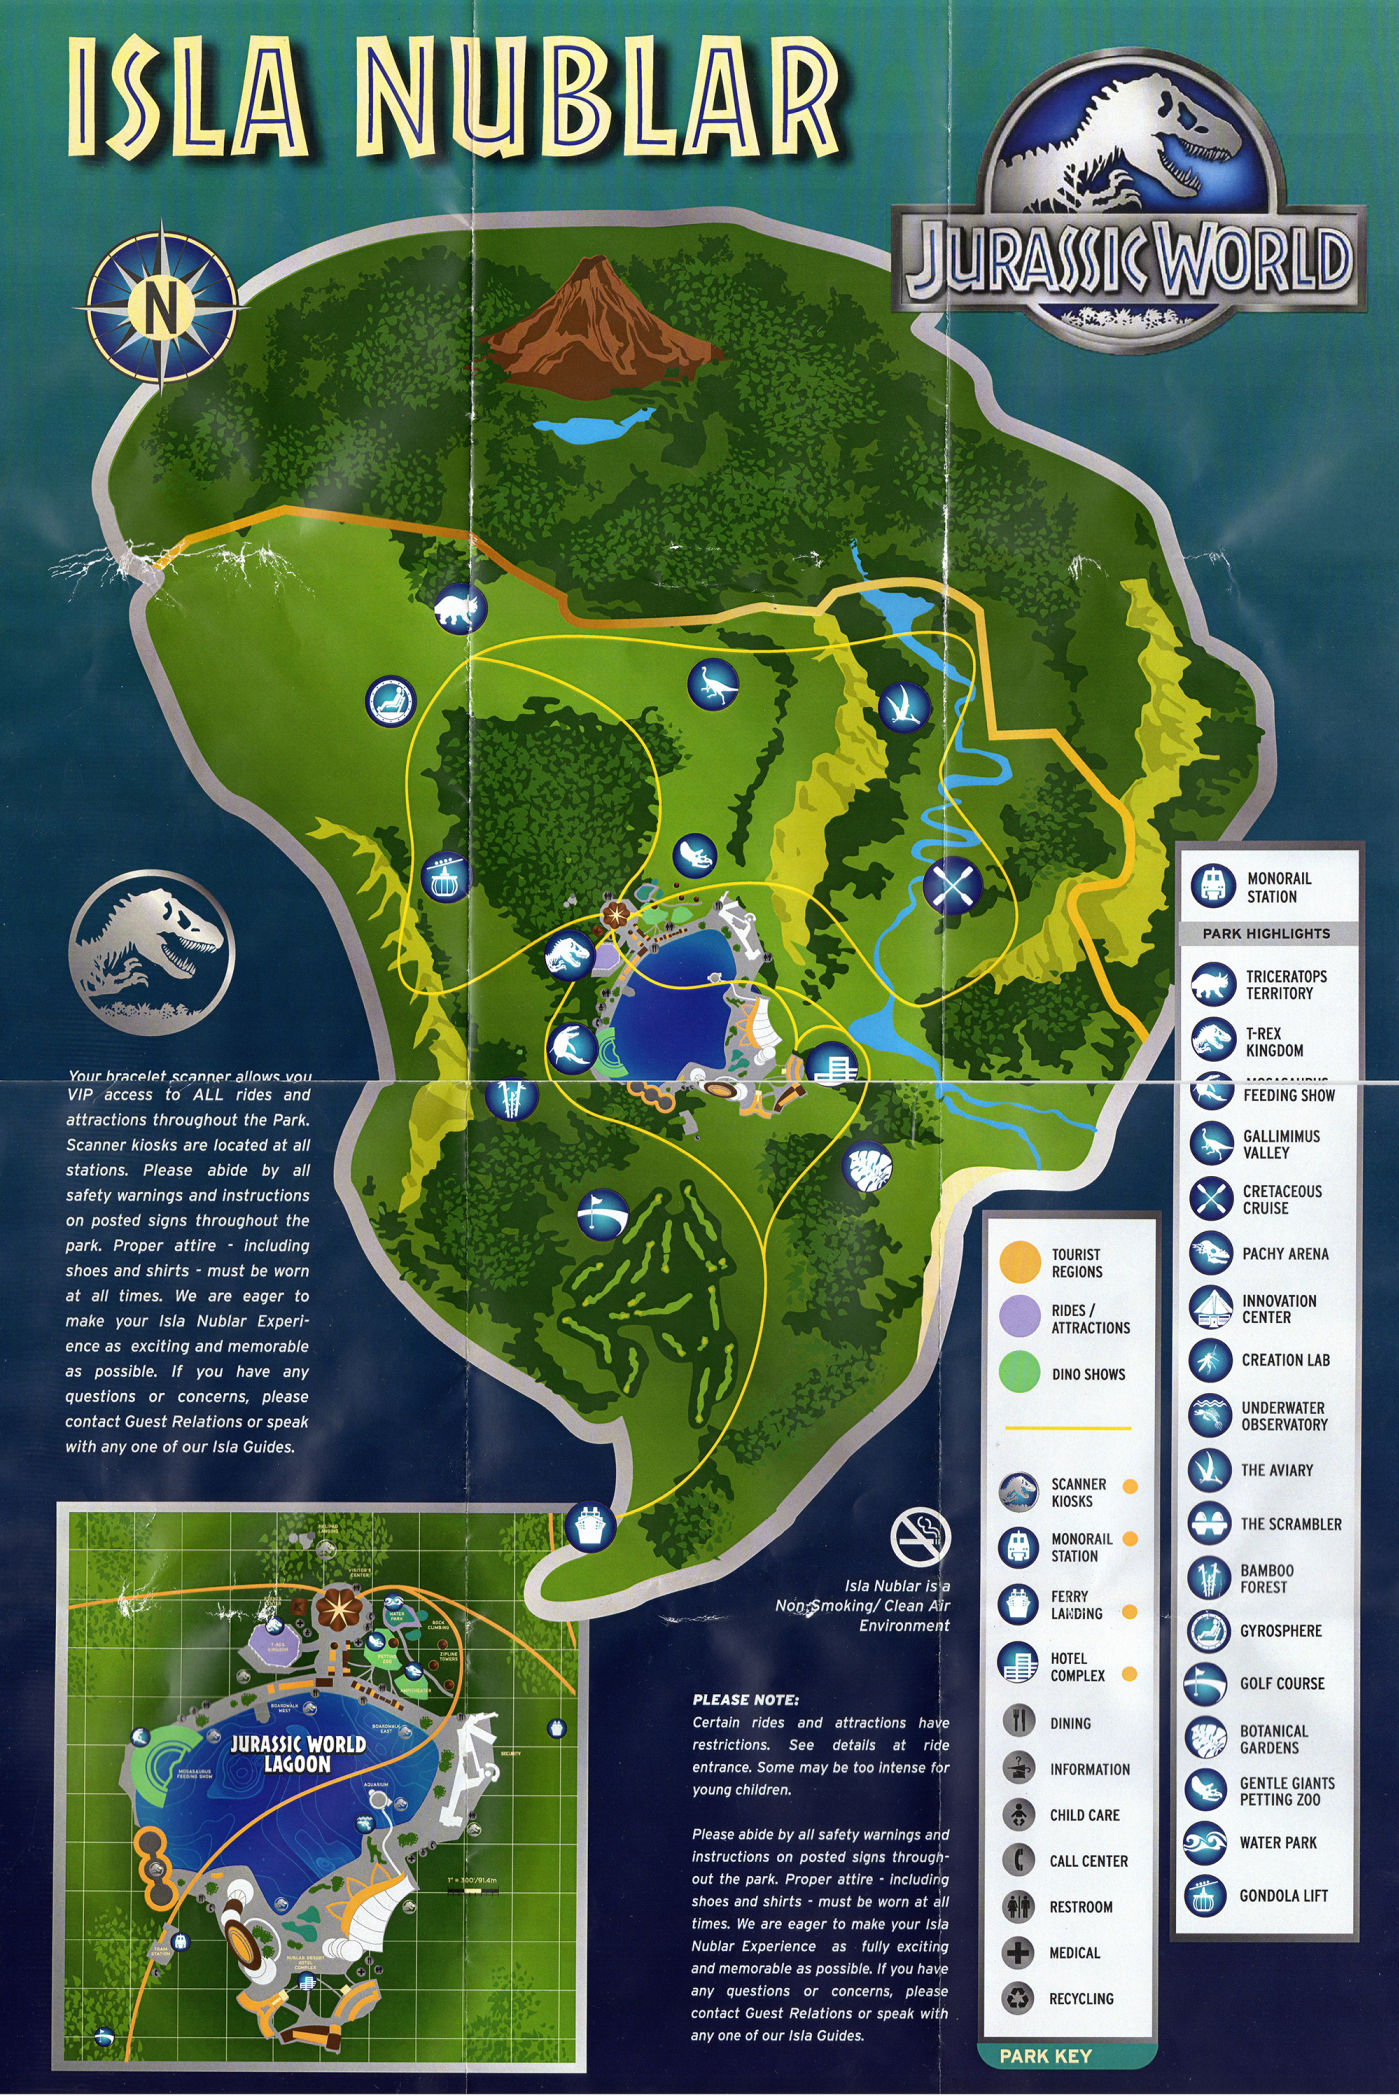 Jurassic World Map Fulljpg Image Jurassic